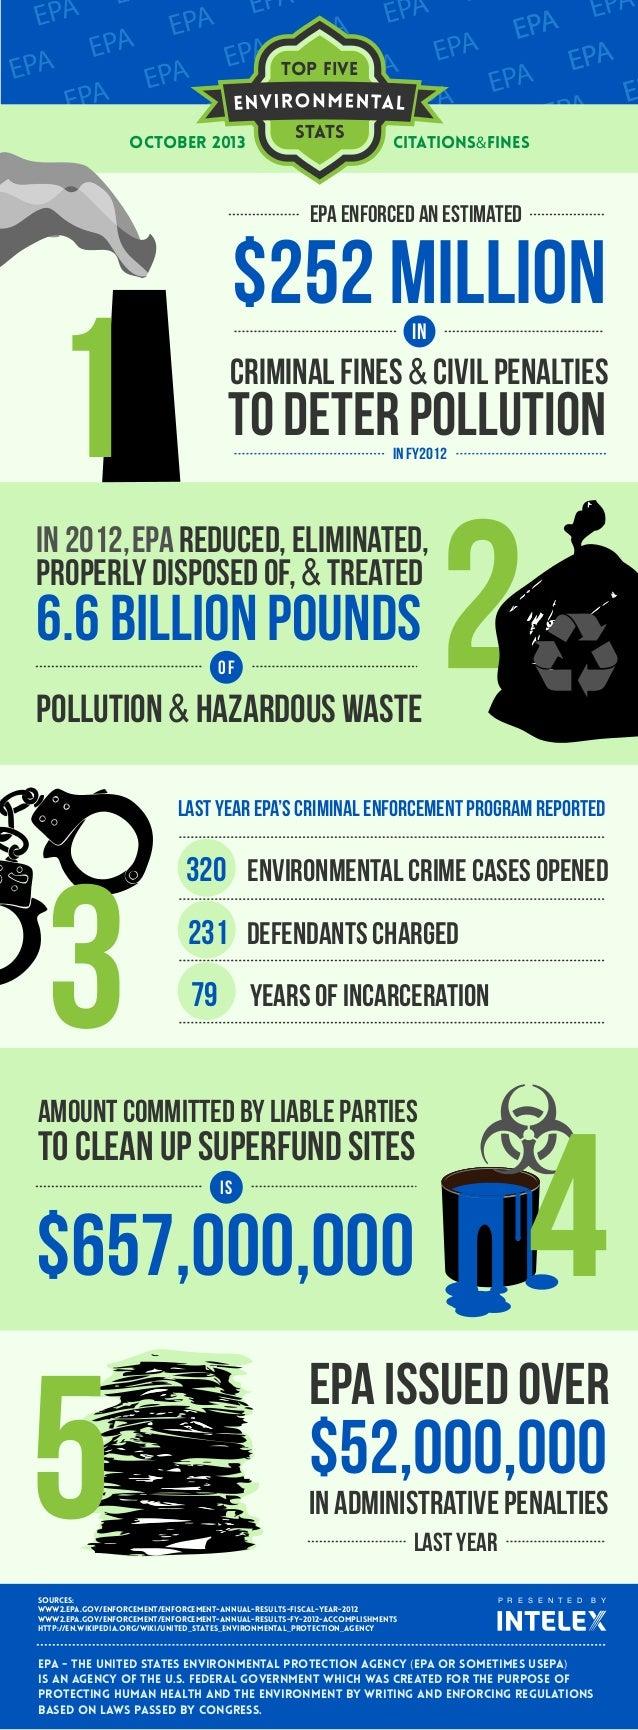 Intelex Top 5 Environmental Statistics - Citations & Fines (infographic)